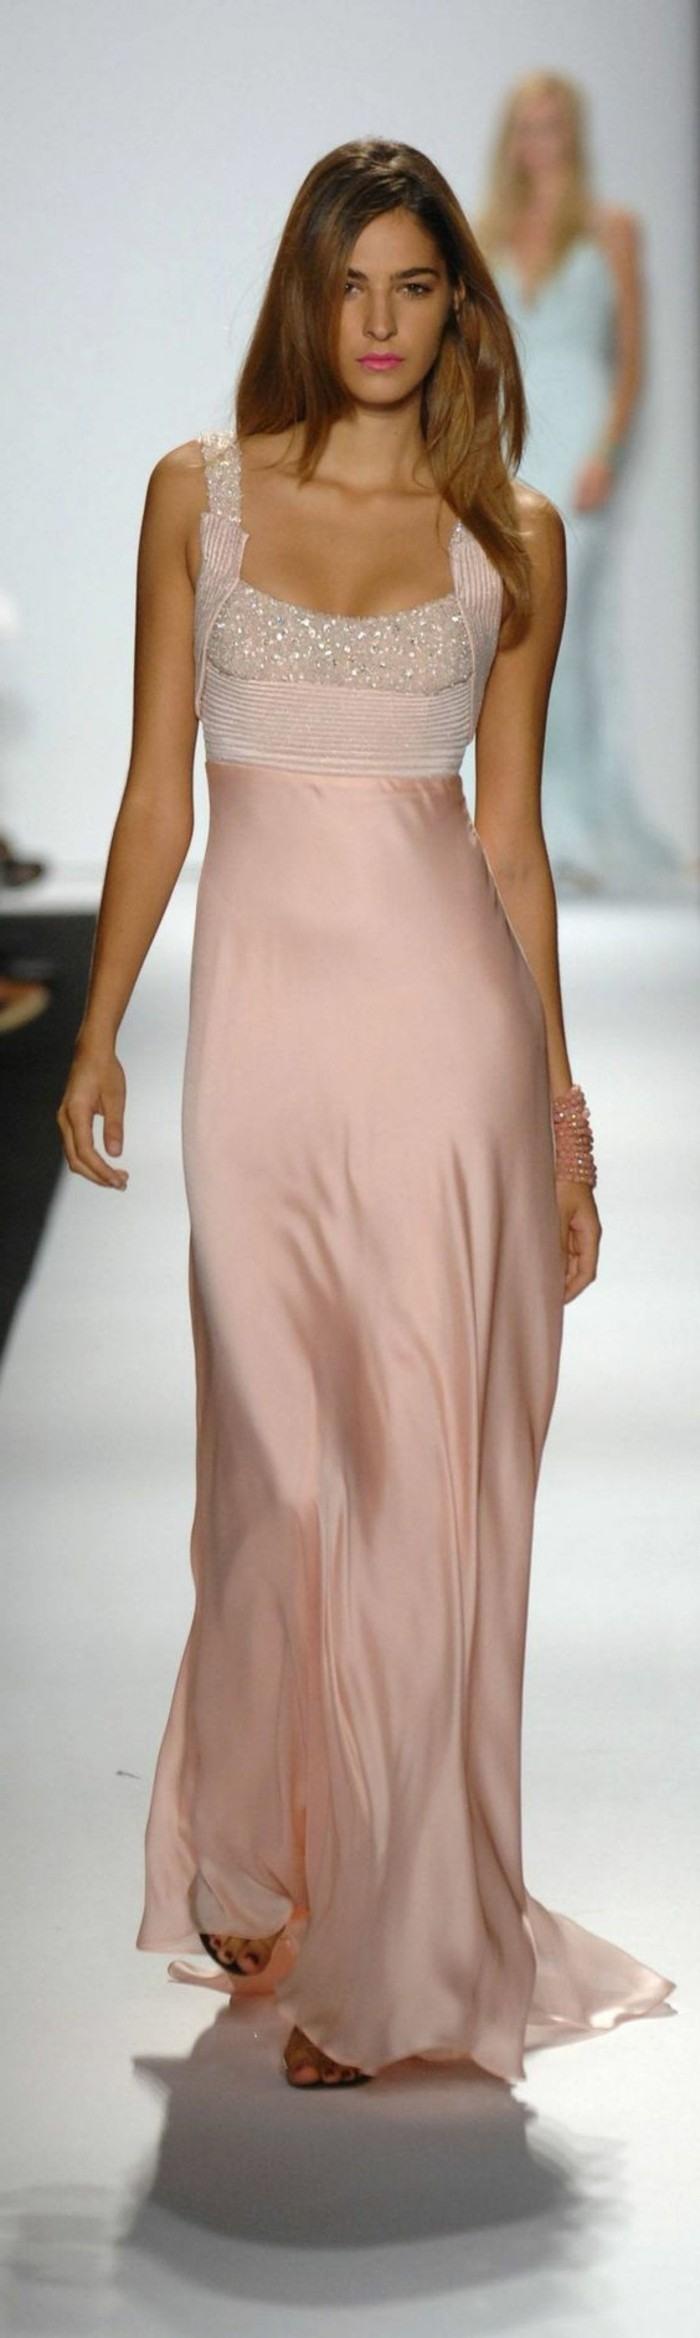 Formal Fantastisch Moderne Elegante Kleider Spezialgebiet20 Wunderbar Moderne Elegante Kleider für 2019